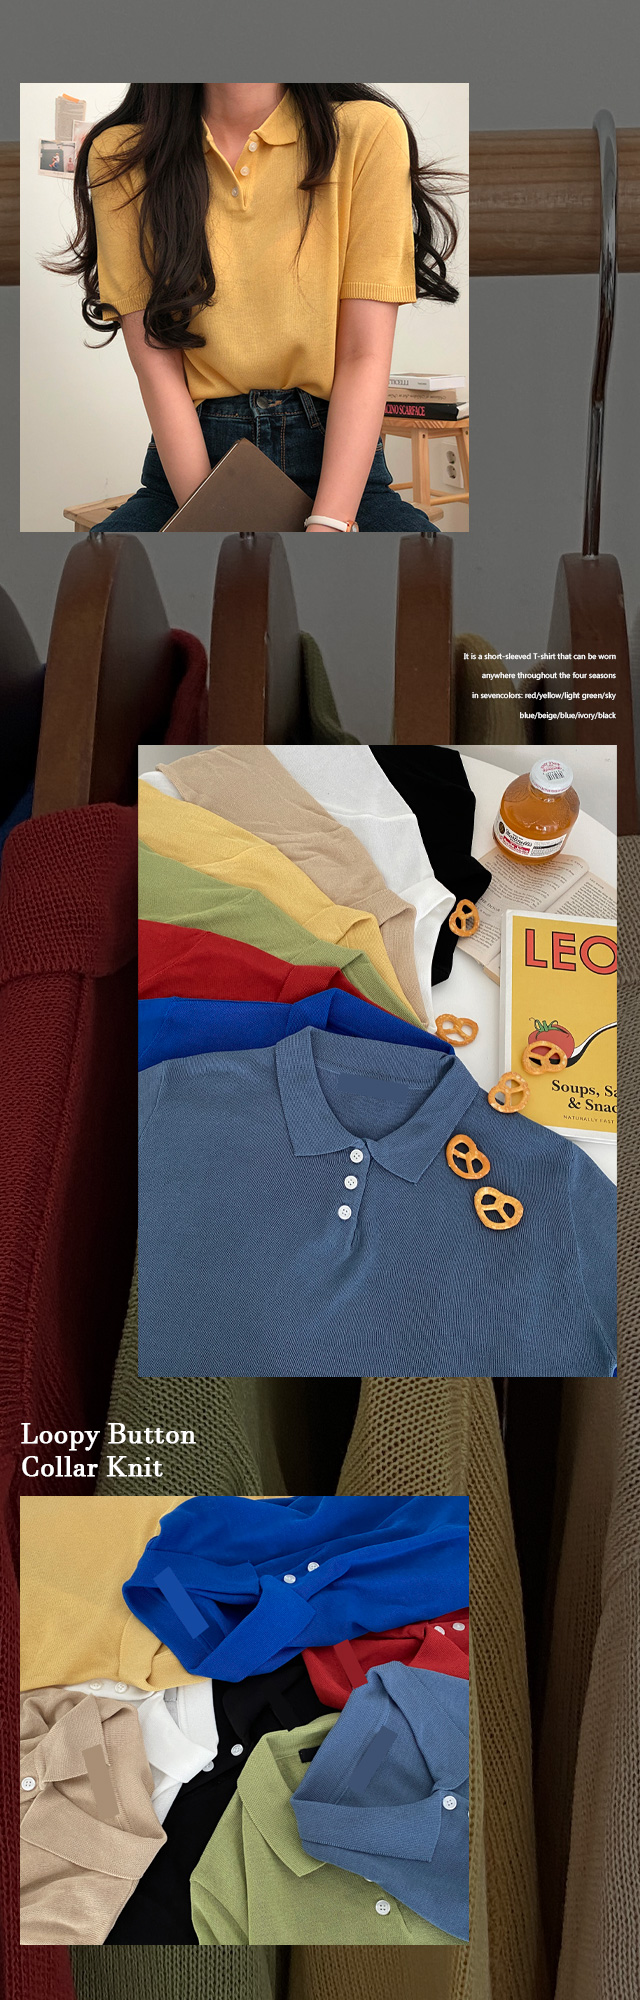 Luffy Button Collar Short Sleeve Knitwear